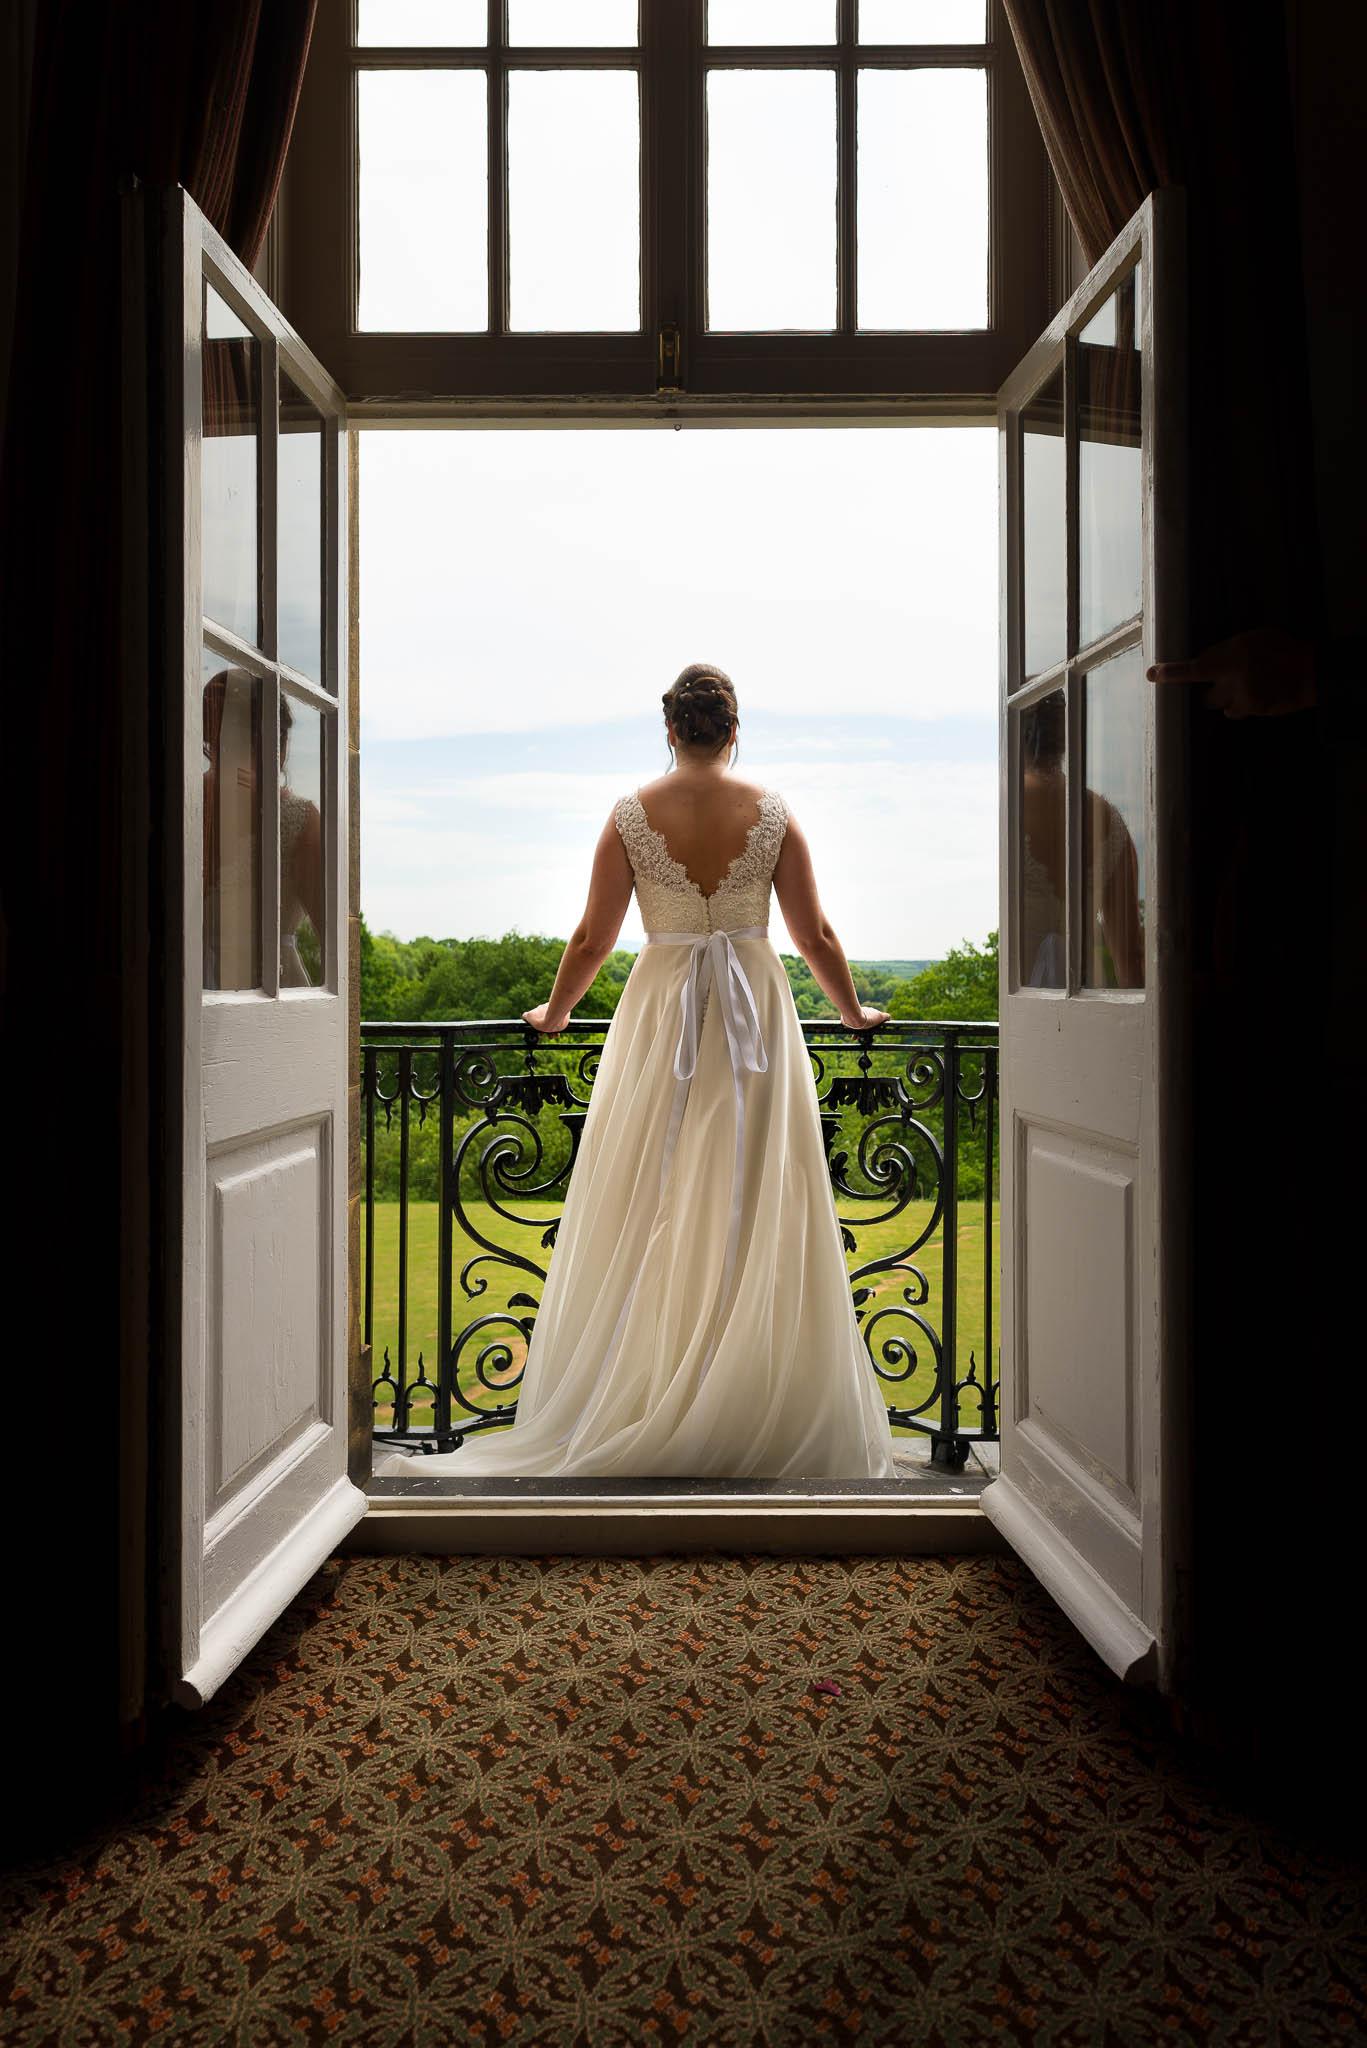 Crathorne Hall Hotel Wedding Photographer43.jpg